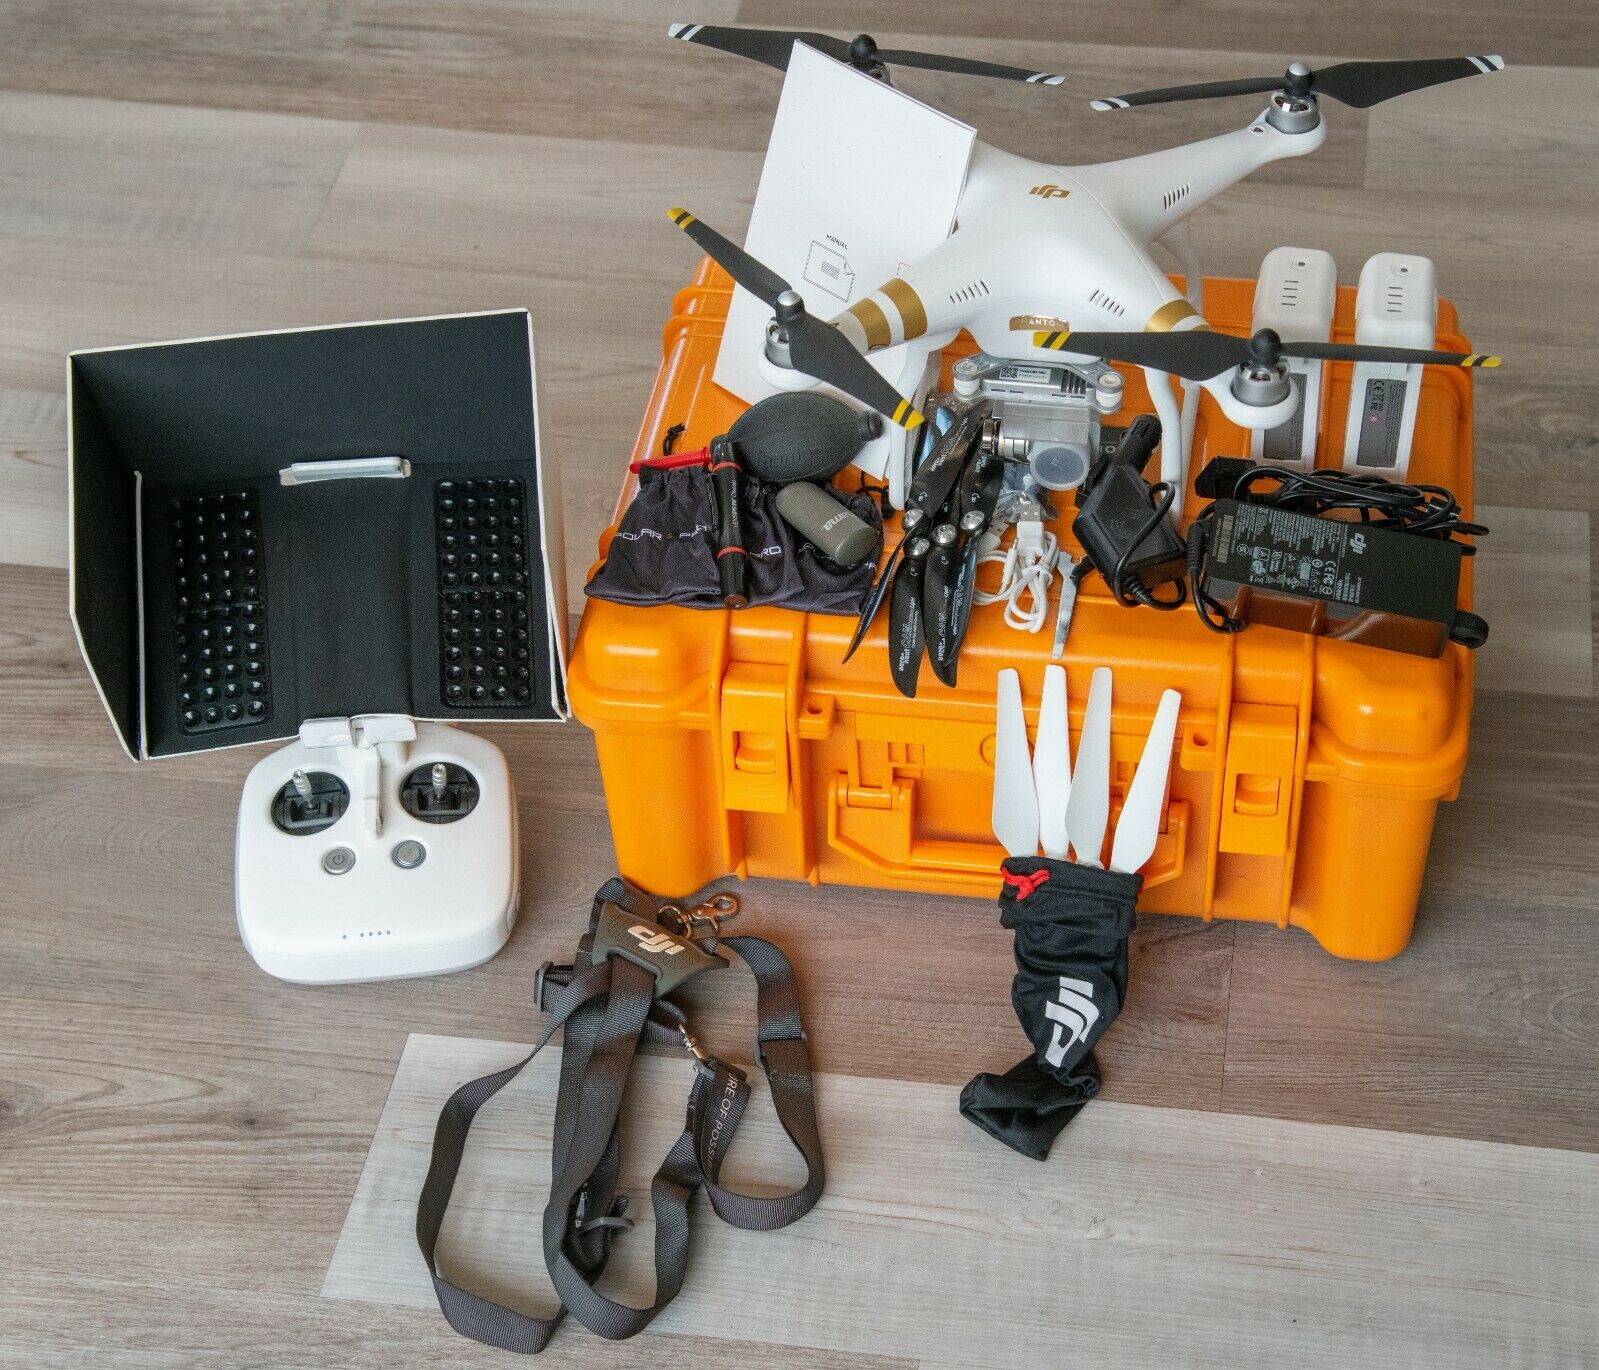 DJI Phantom 3 Pro 4k Drohne Weiß inkl. Controller und B&W Outdoor Case Type 61